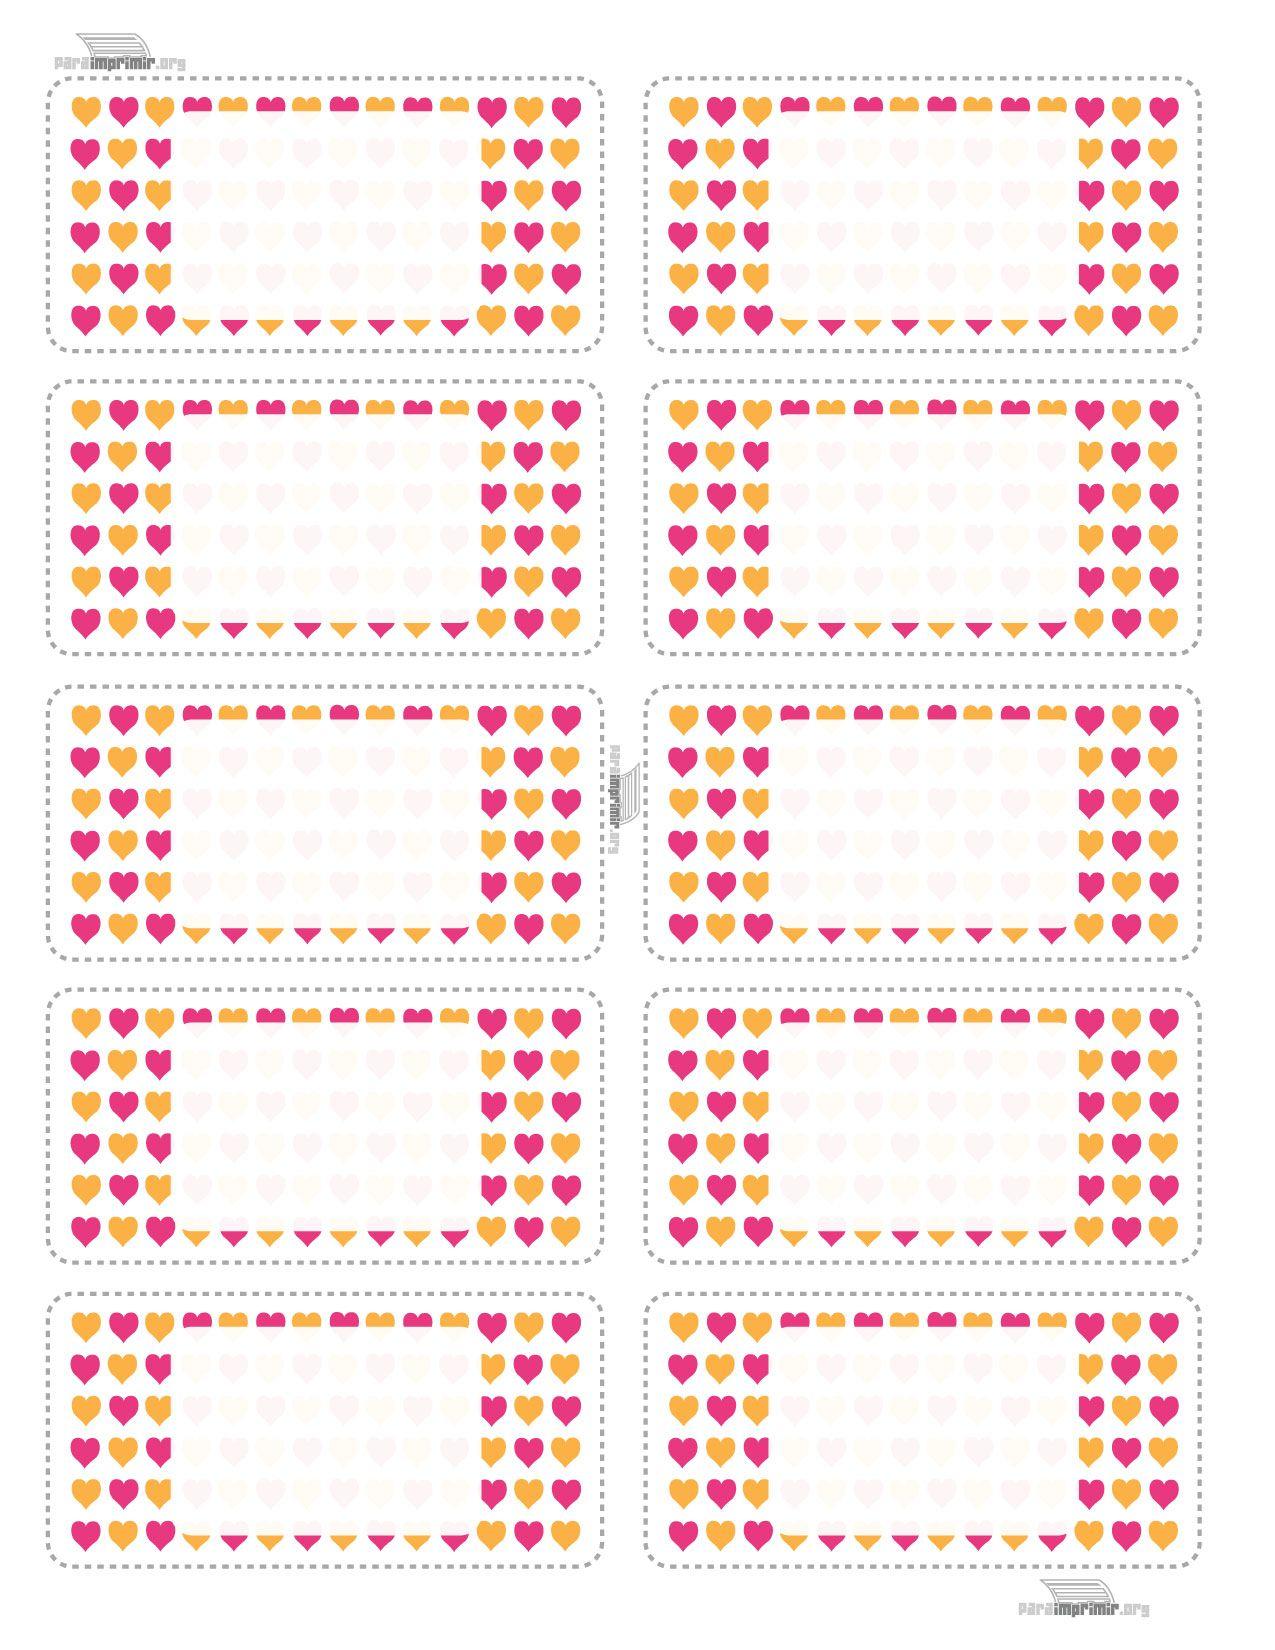 Etiquetas-escolares-de-corazon | Tags | Pinterest | Escolares ...